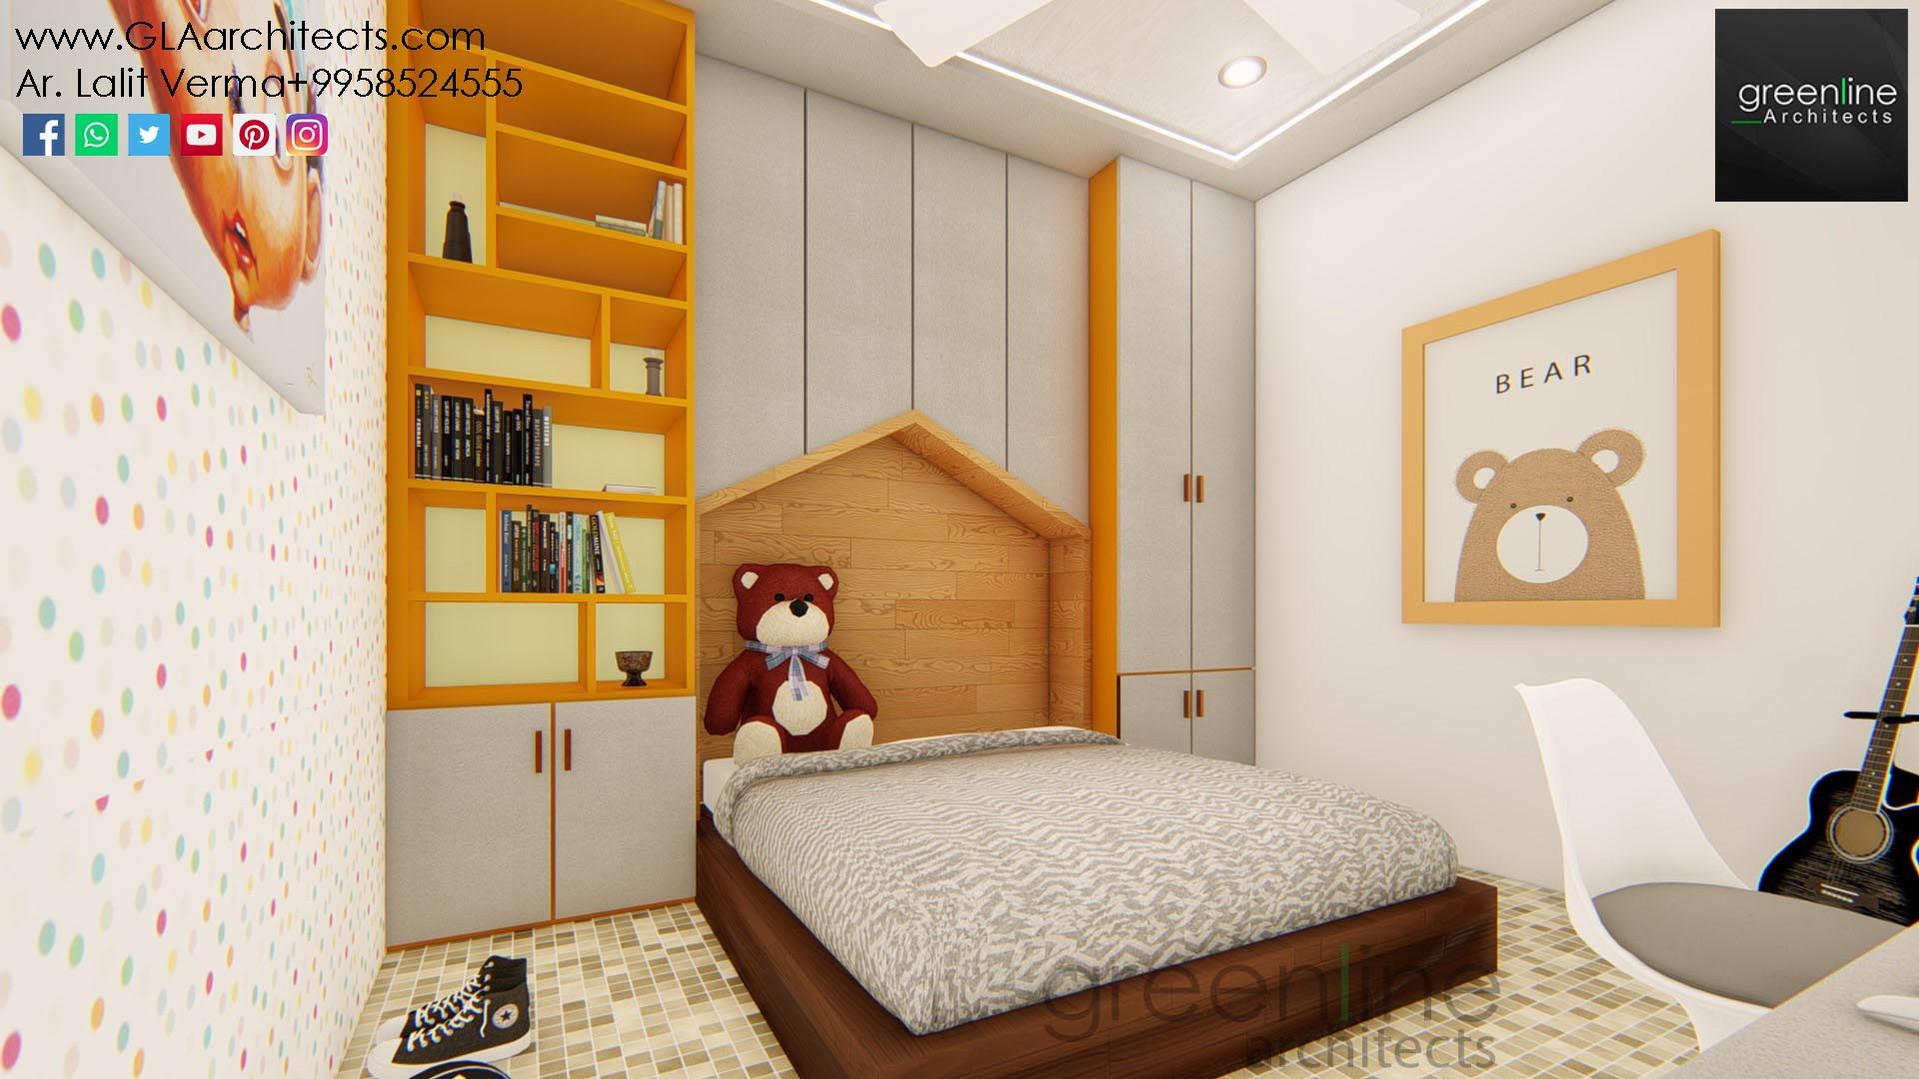 3 BHK-Apartment_Home Interior (12).jpg